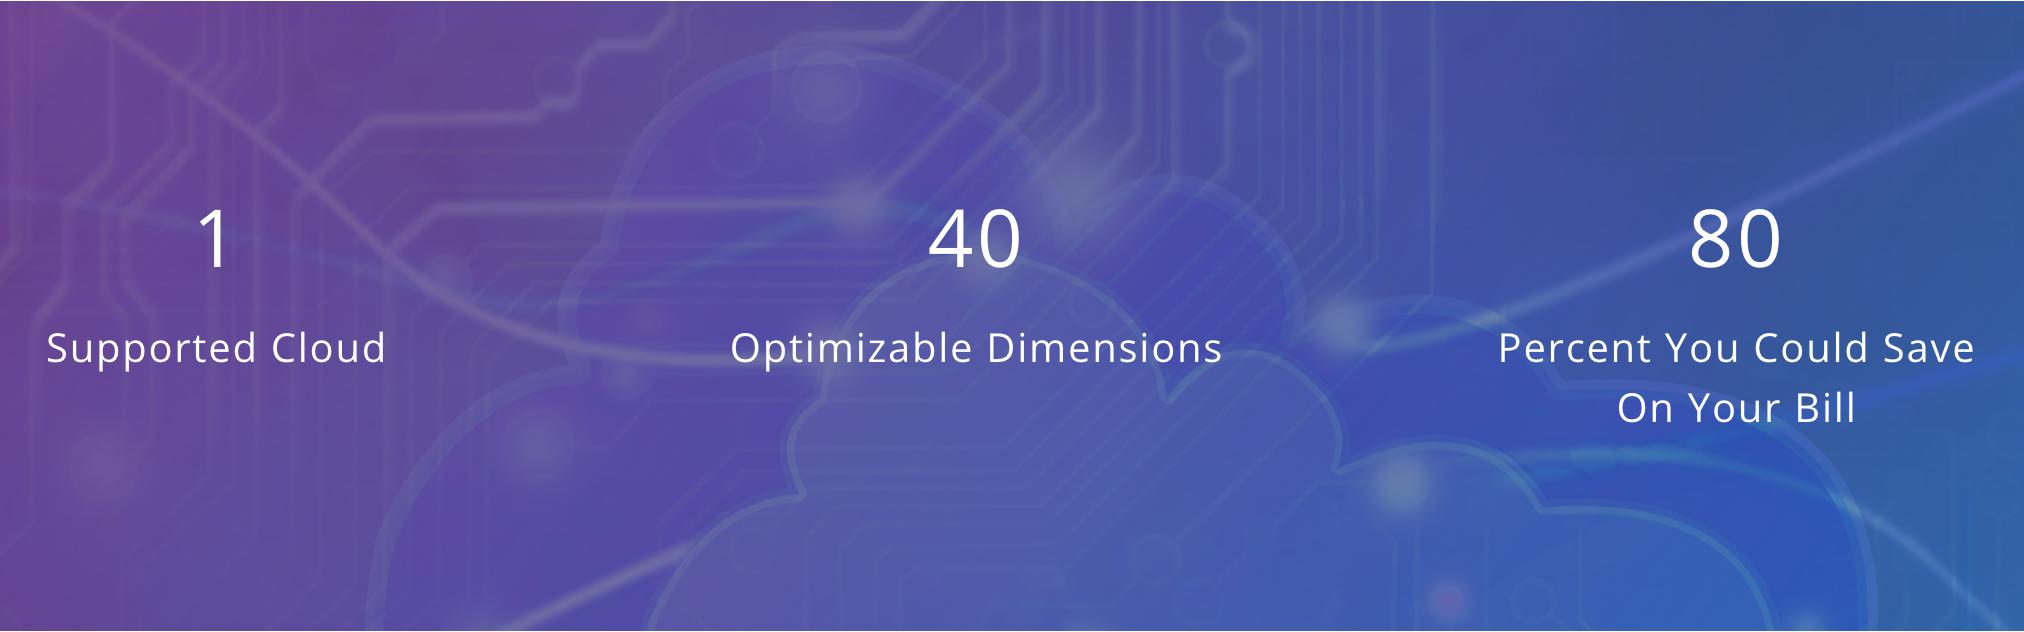 cloud optimization as a service